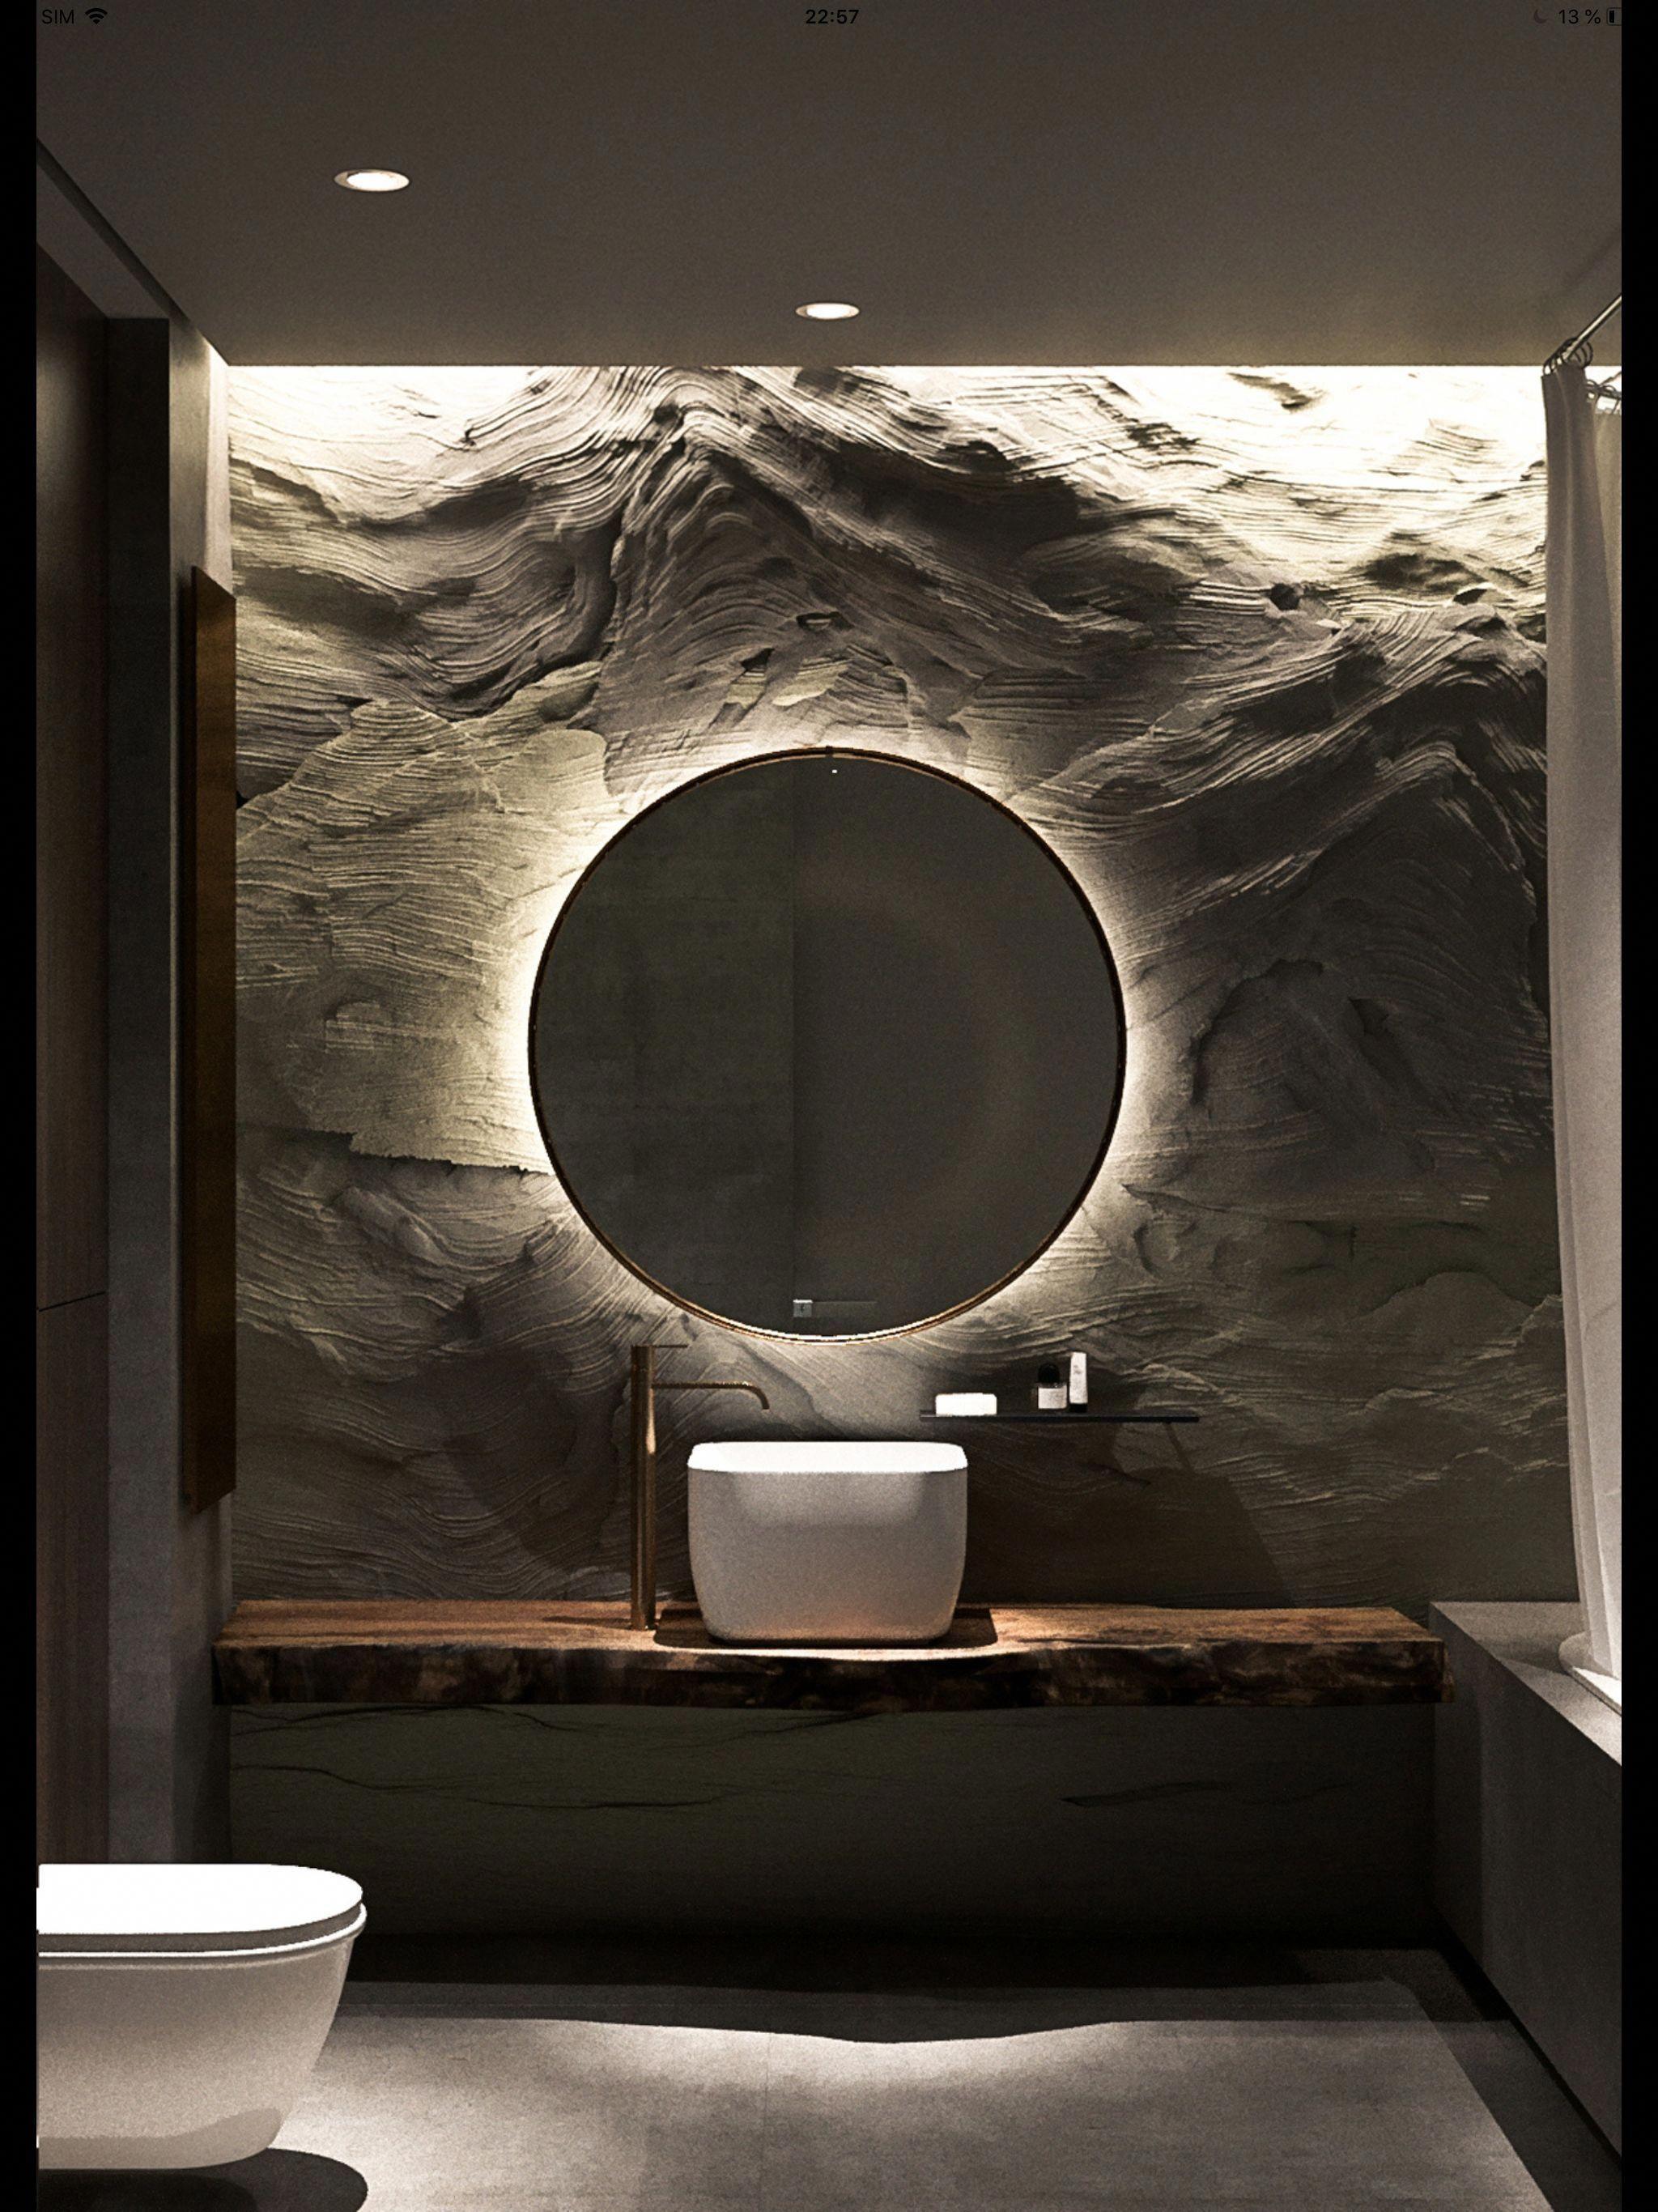 I Appreciate This Incredible Photo Halfbathroom Bathroom Inspiration Modern Bathroom Inspiration Decor Modern Bathroom Design